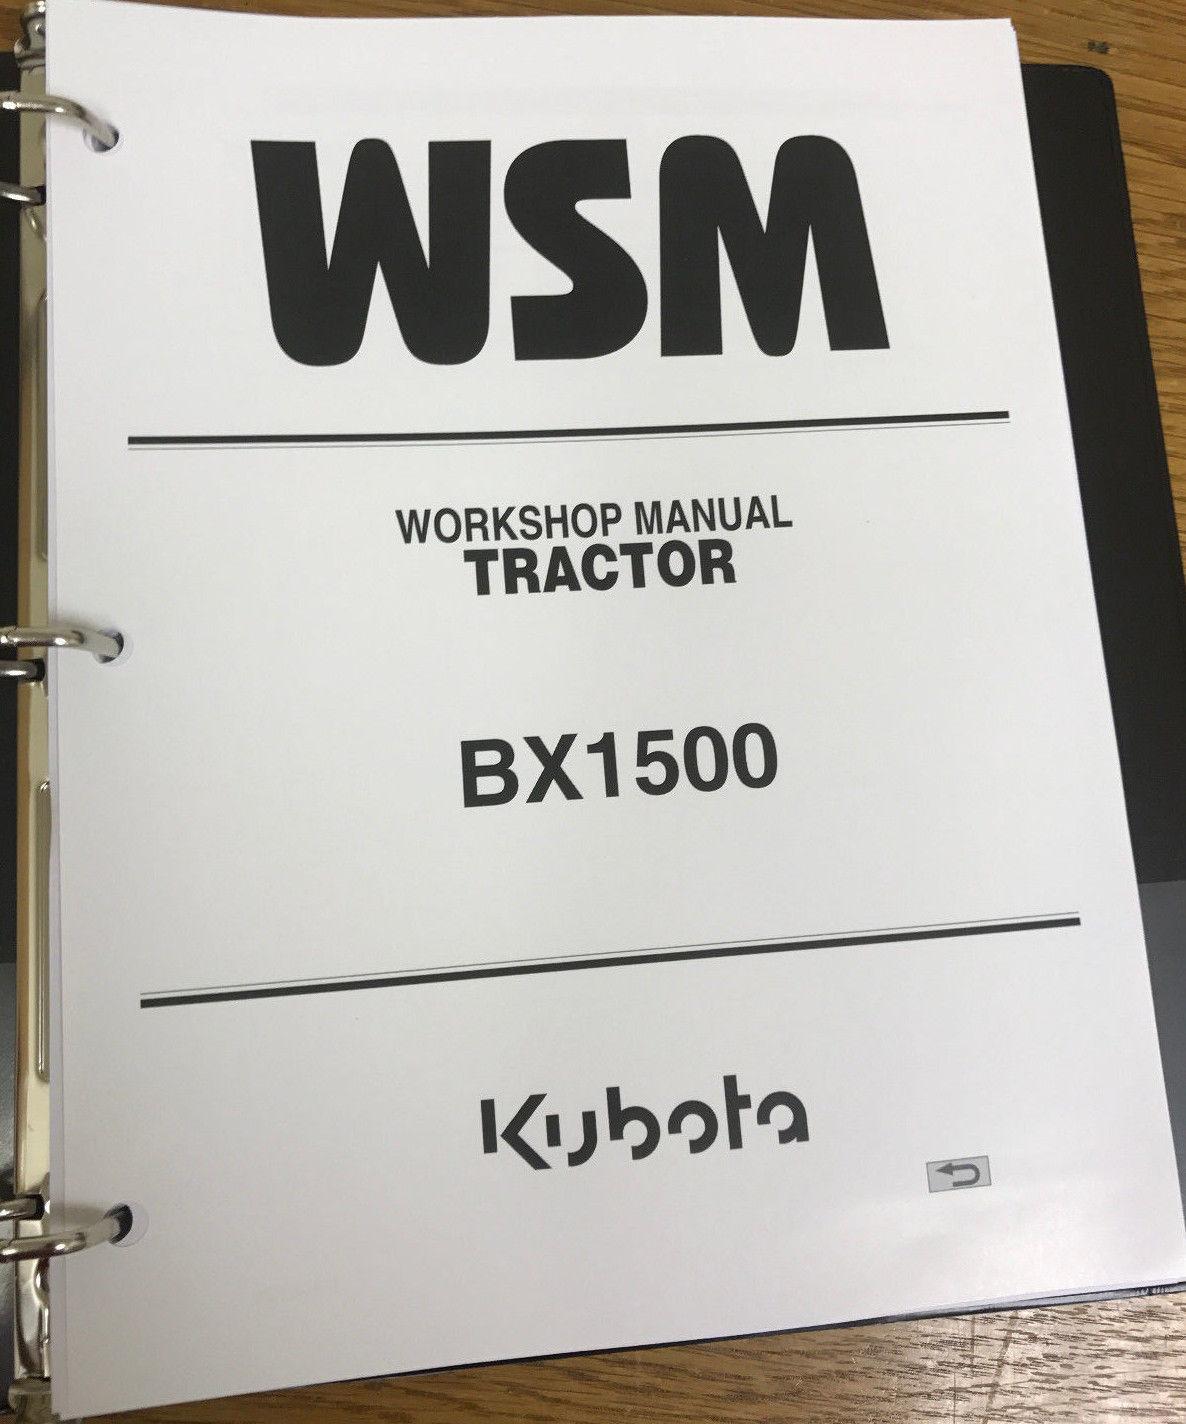 kubota bx1500 bx 1500 tractor service and 13 similar items rh bonanza com  Kubota BX2230 Manual BX1500 Kubota Specifications